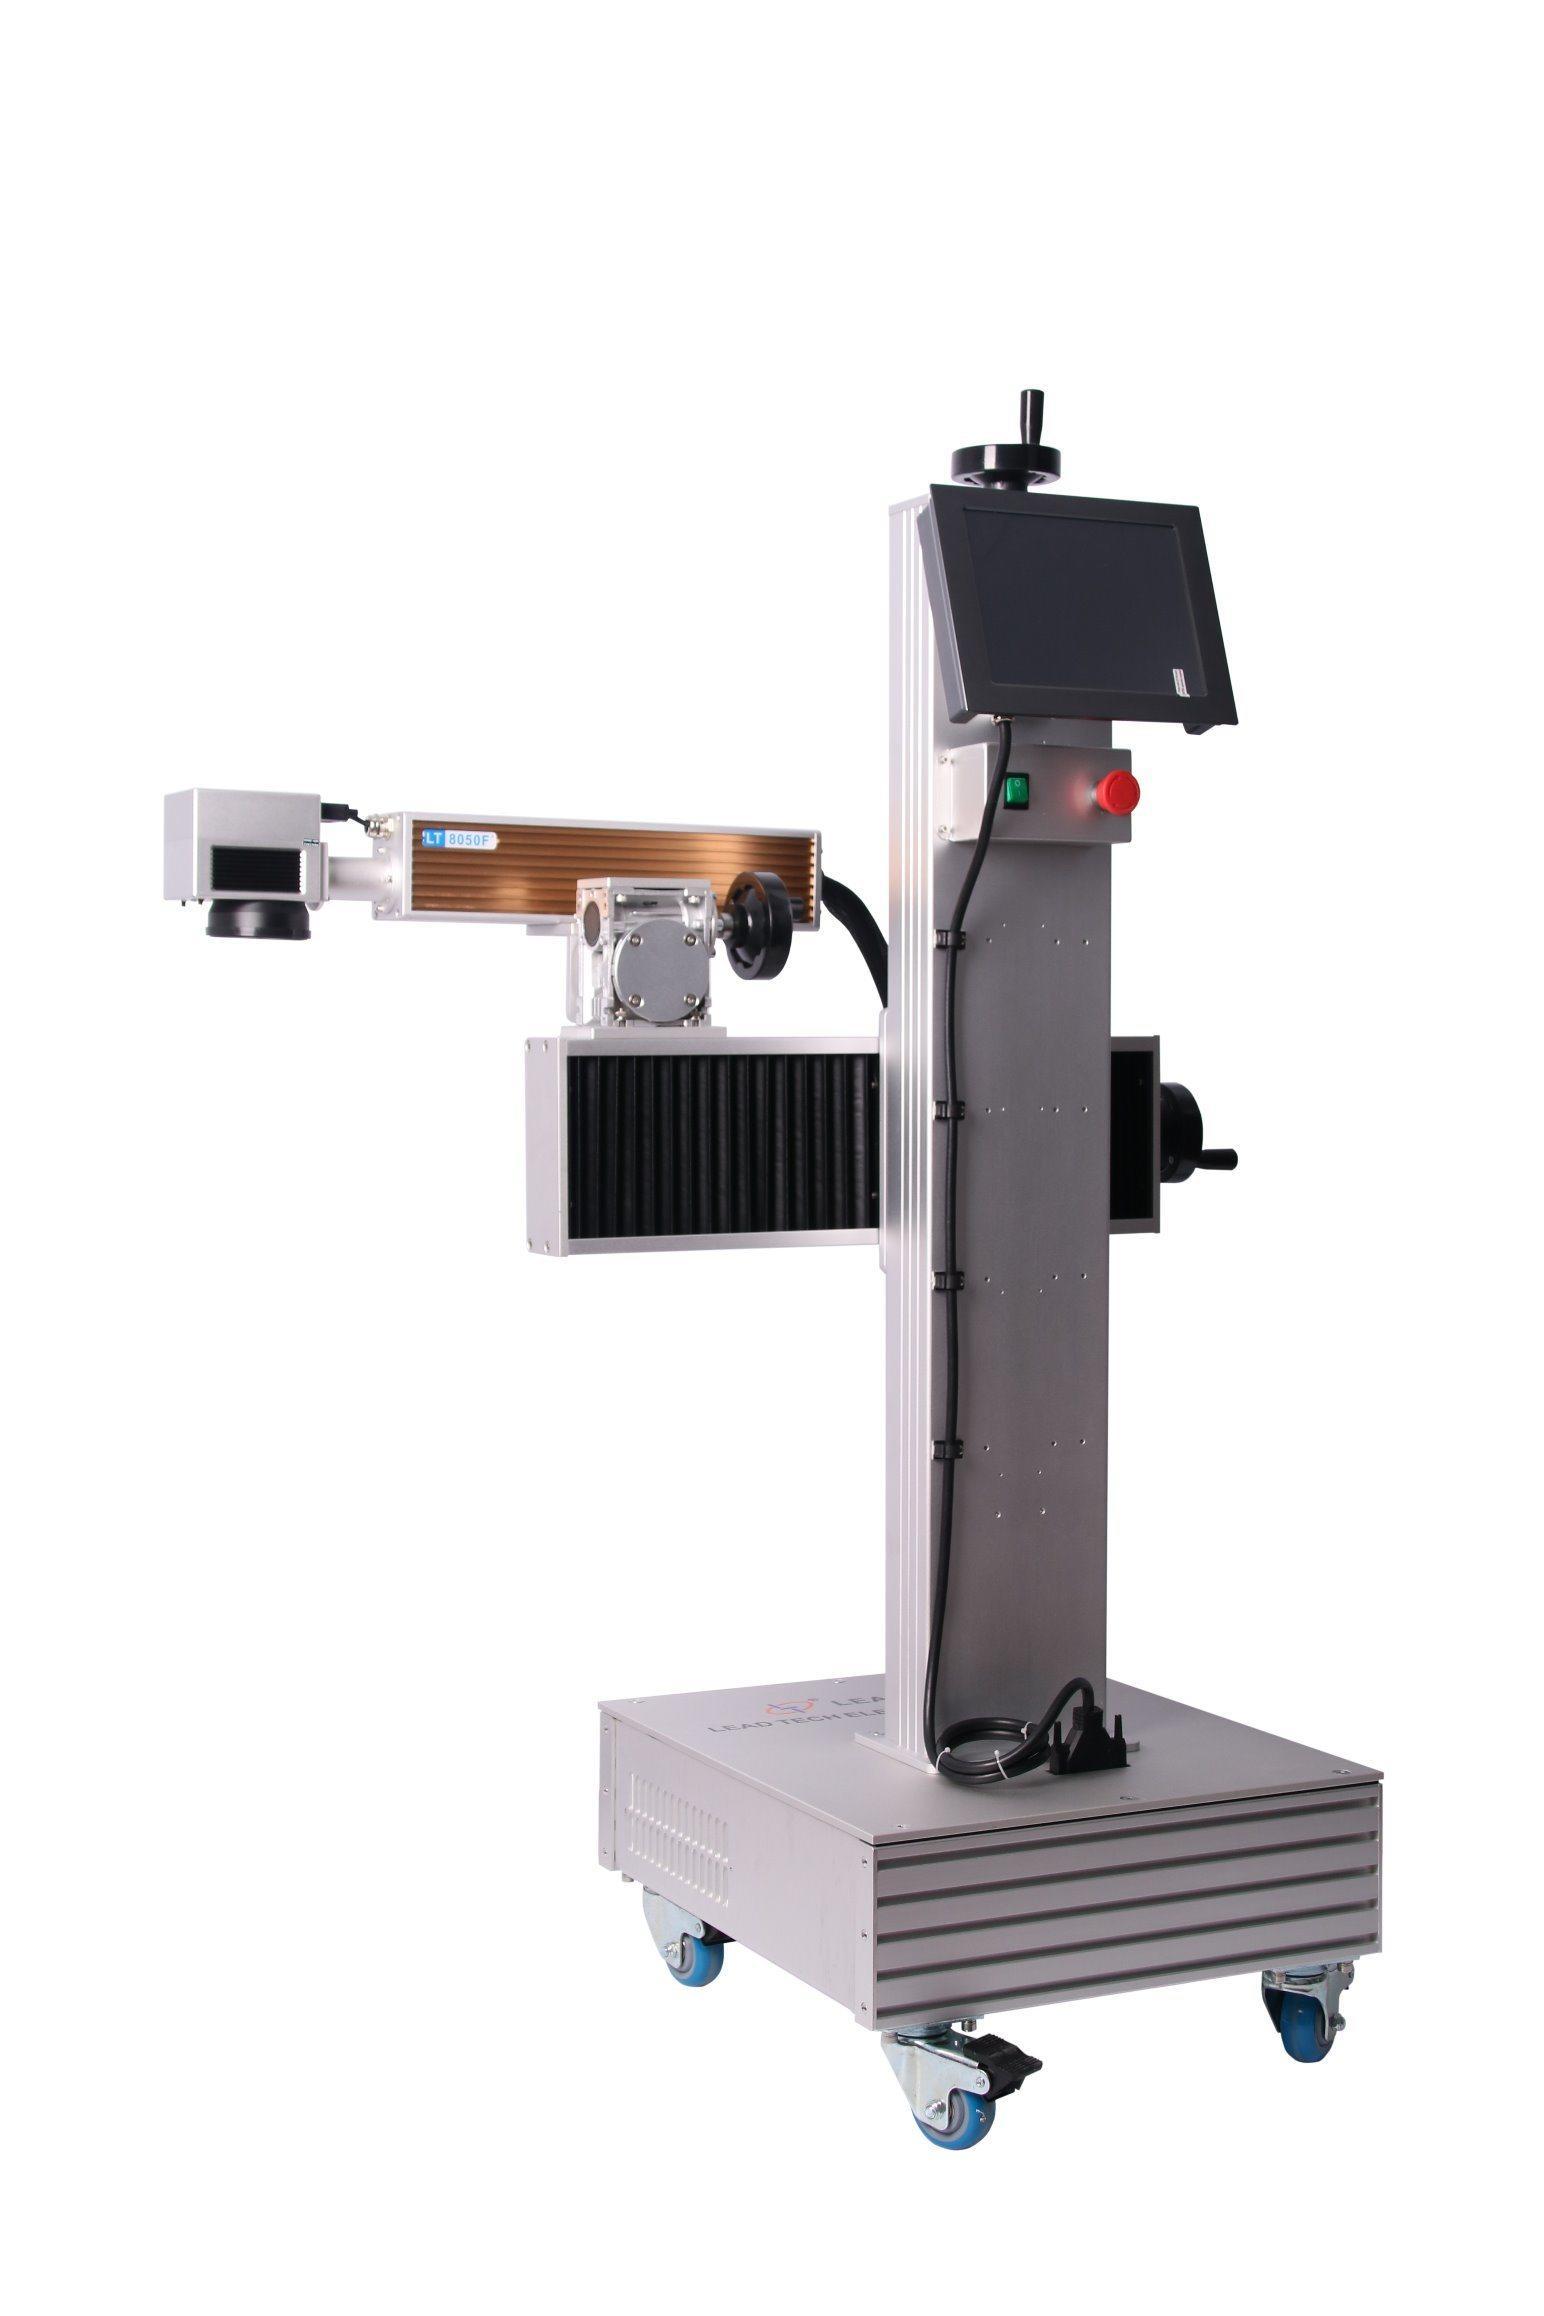 Lt8020f/Lt8030f/Lt8050f Fiber 20W/30W/50W High Precision Digital Laser Engraving Marking Printer for Cans/Plastics